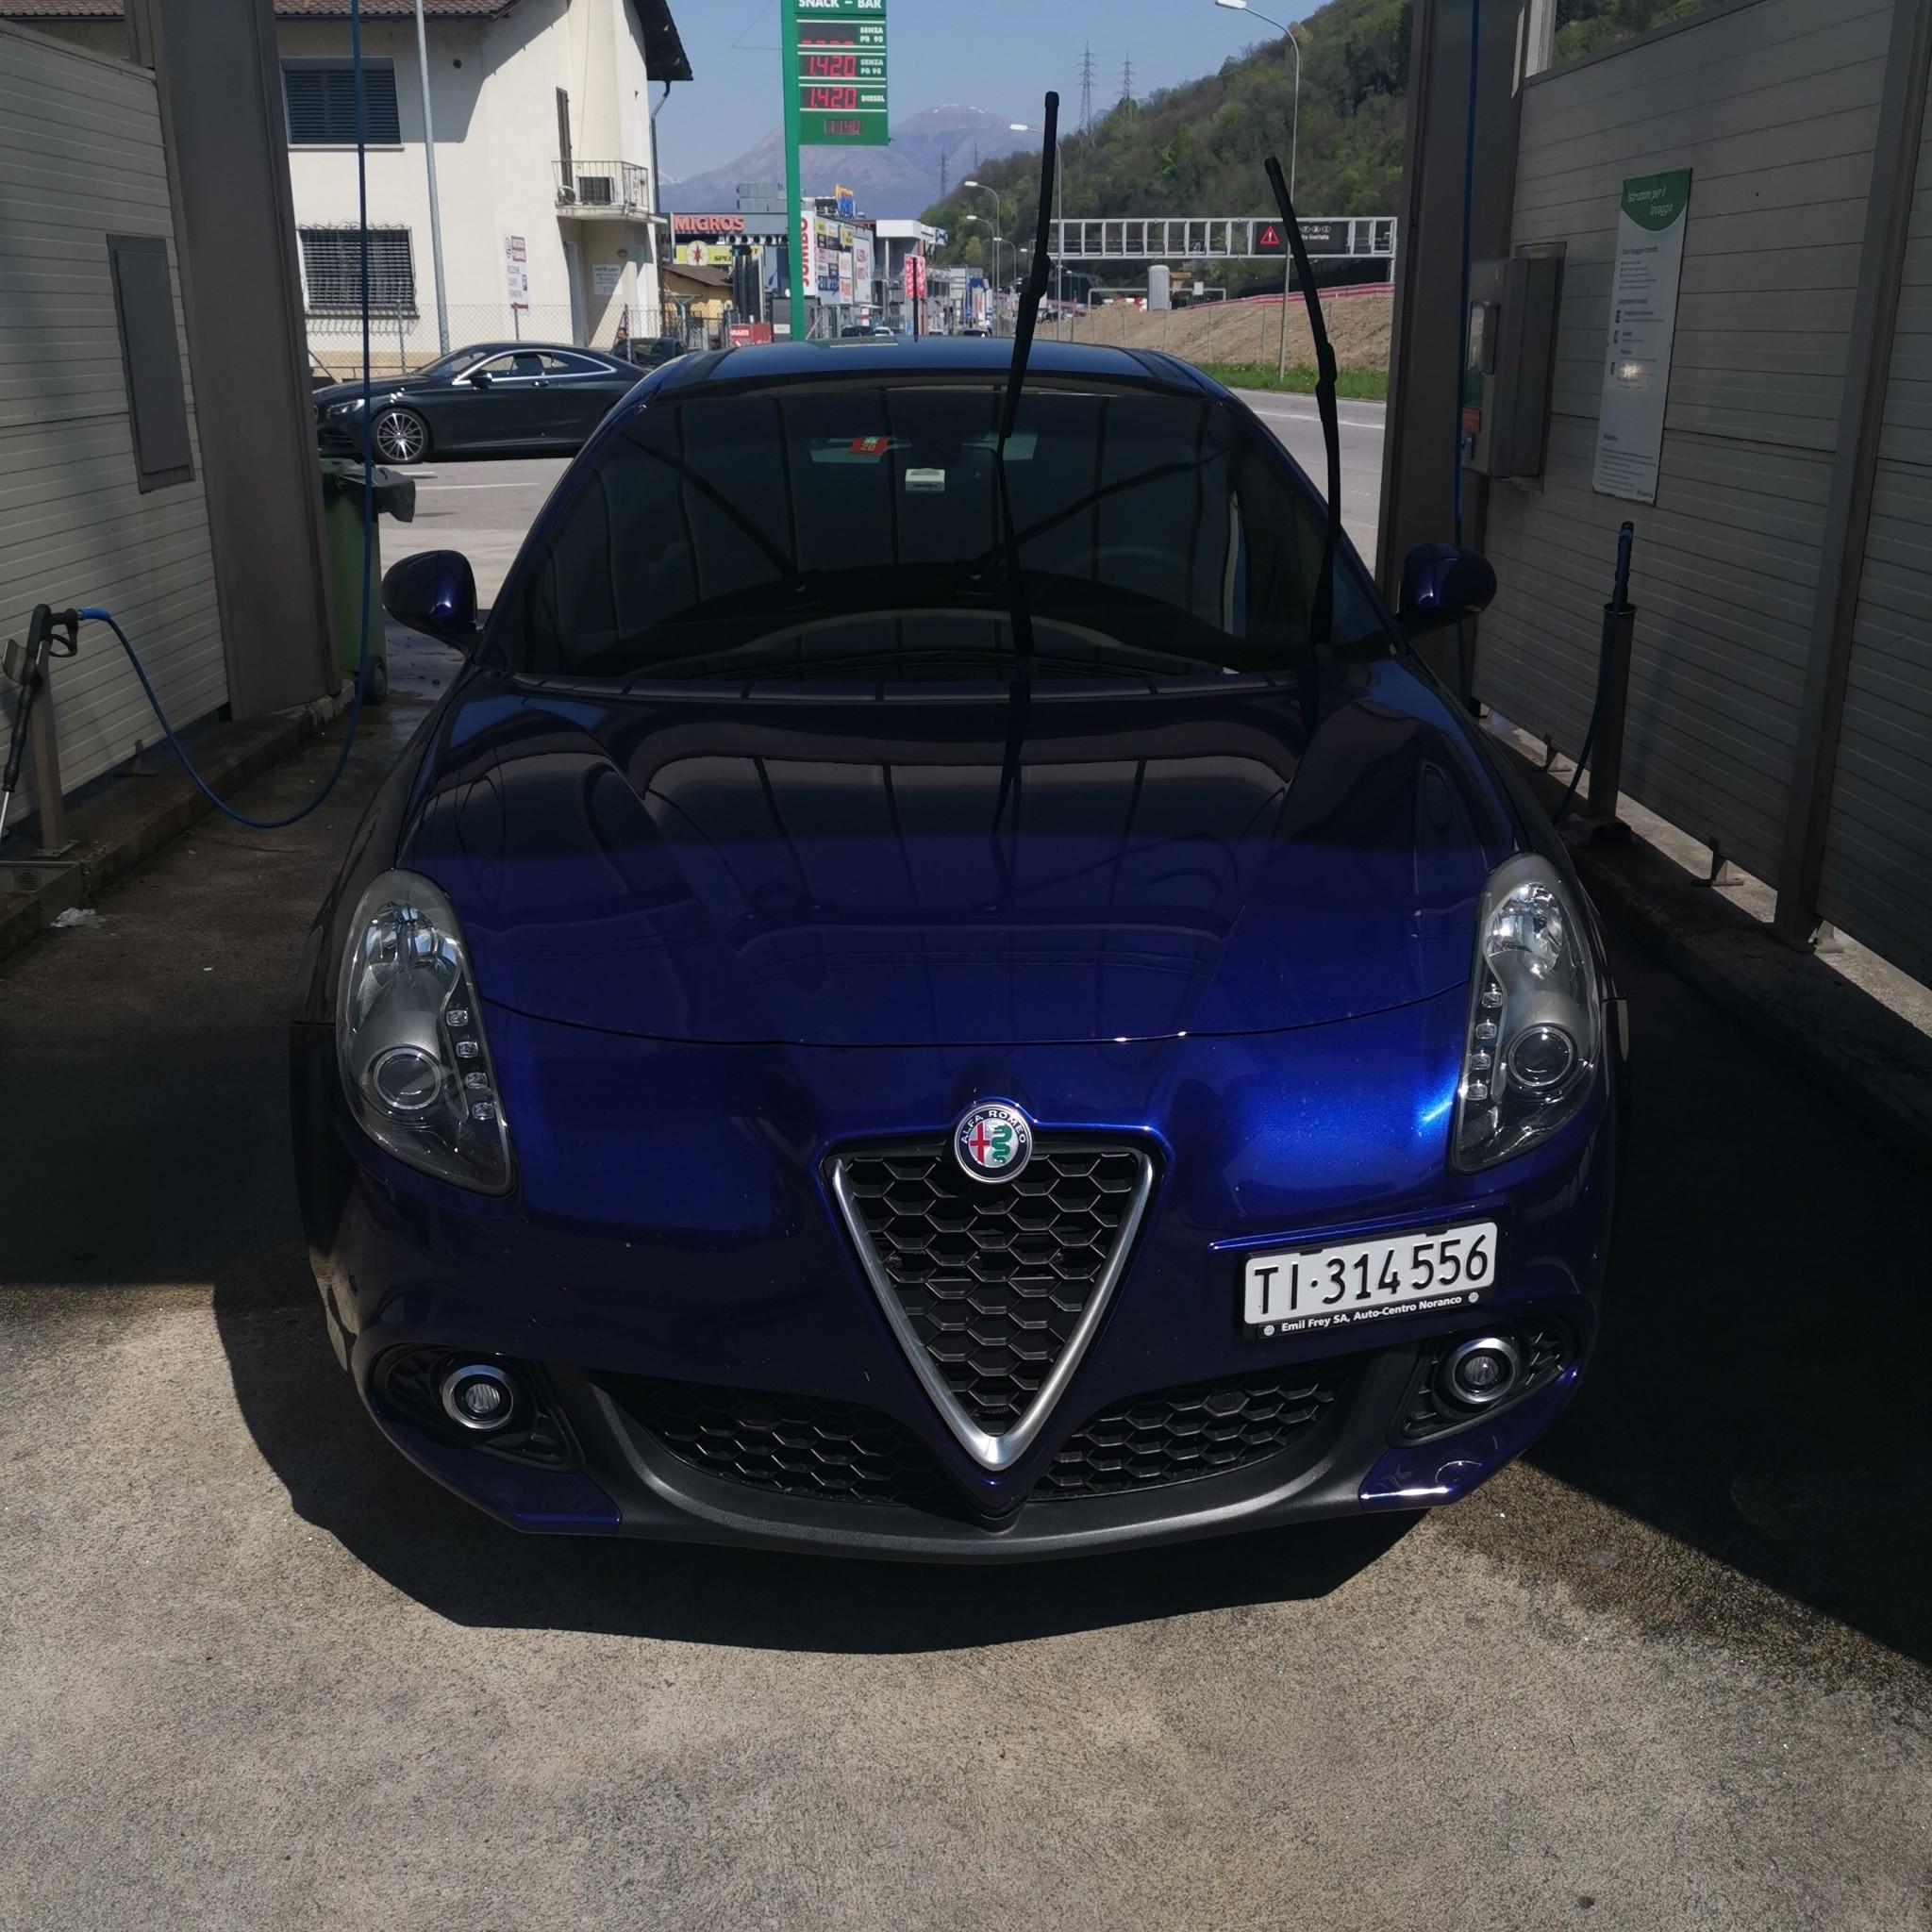 saloon Alfa Romeo Giulietta Alfa Romeo Giulietta